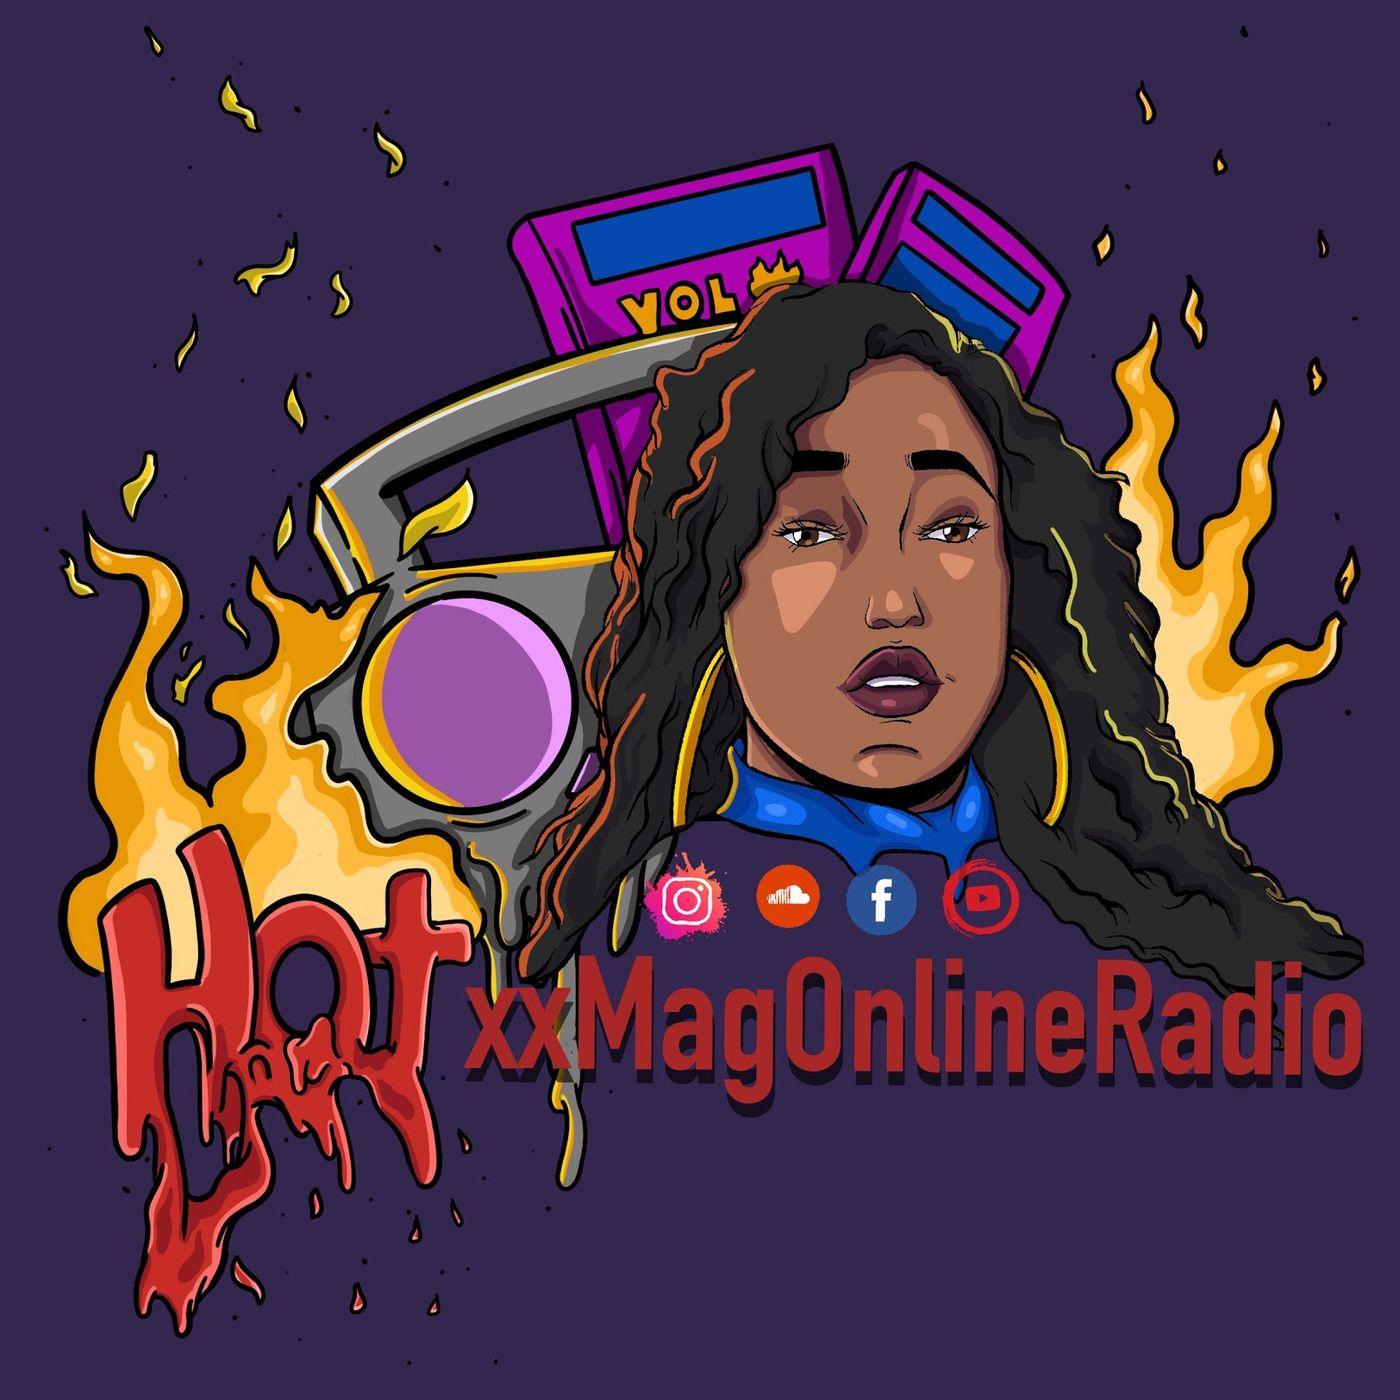 HotxxMagOnlineRadio LIVE #UndergroundNoise